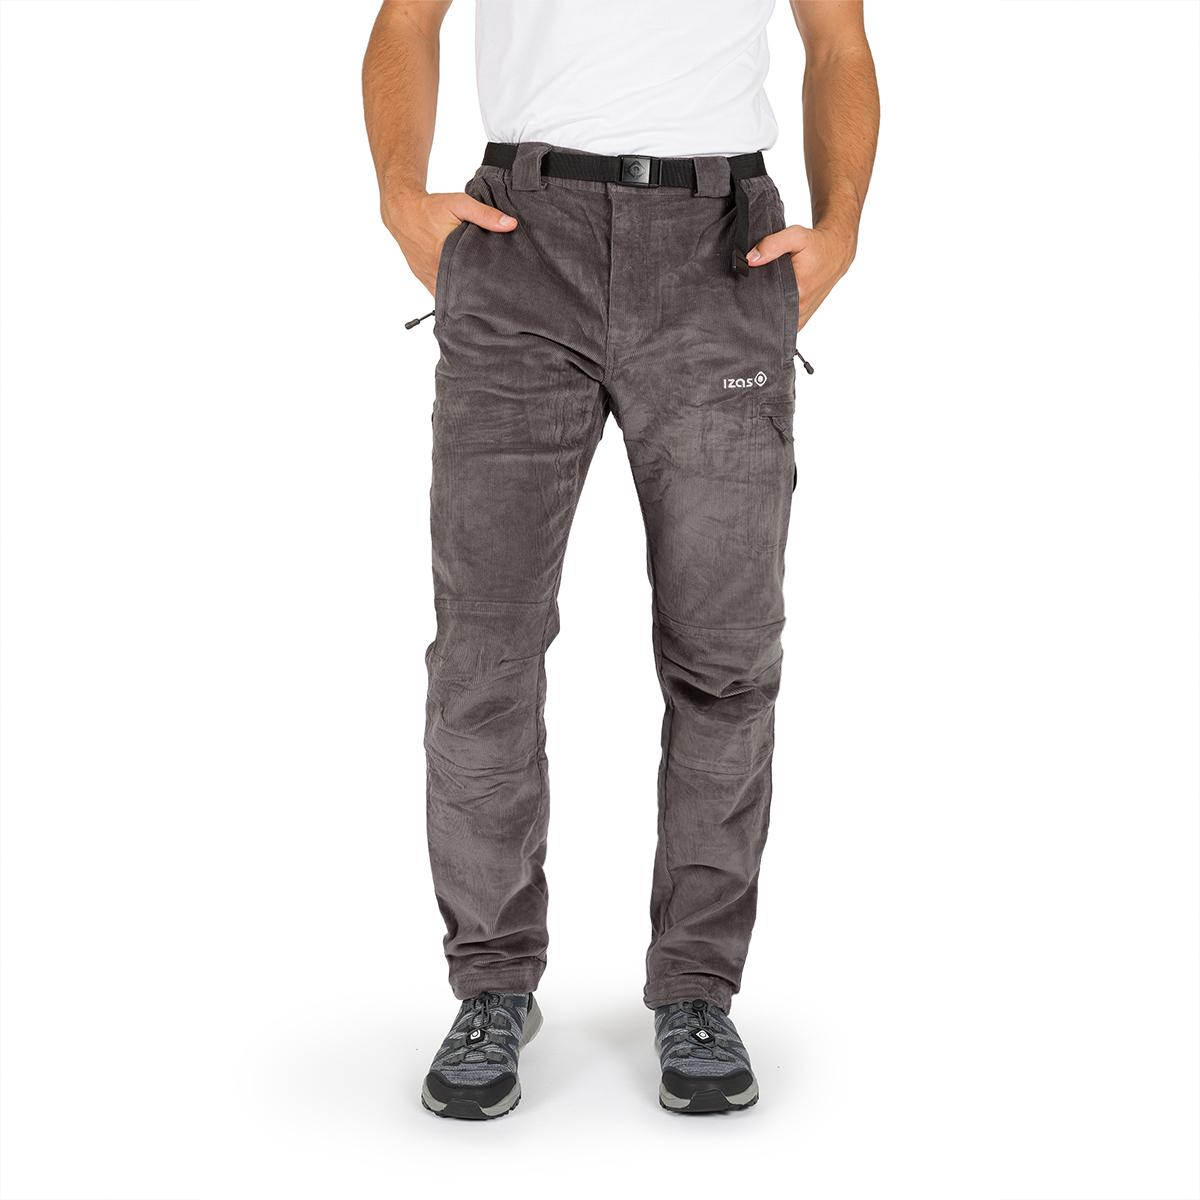 MAN'S GSTAAD STRETCH PANT (CORDUROY) GREY